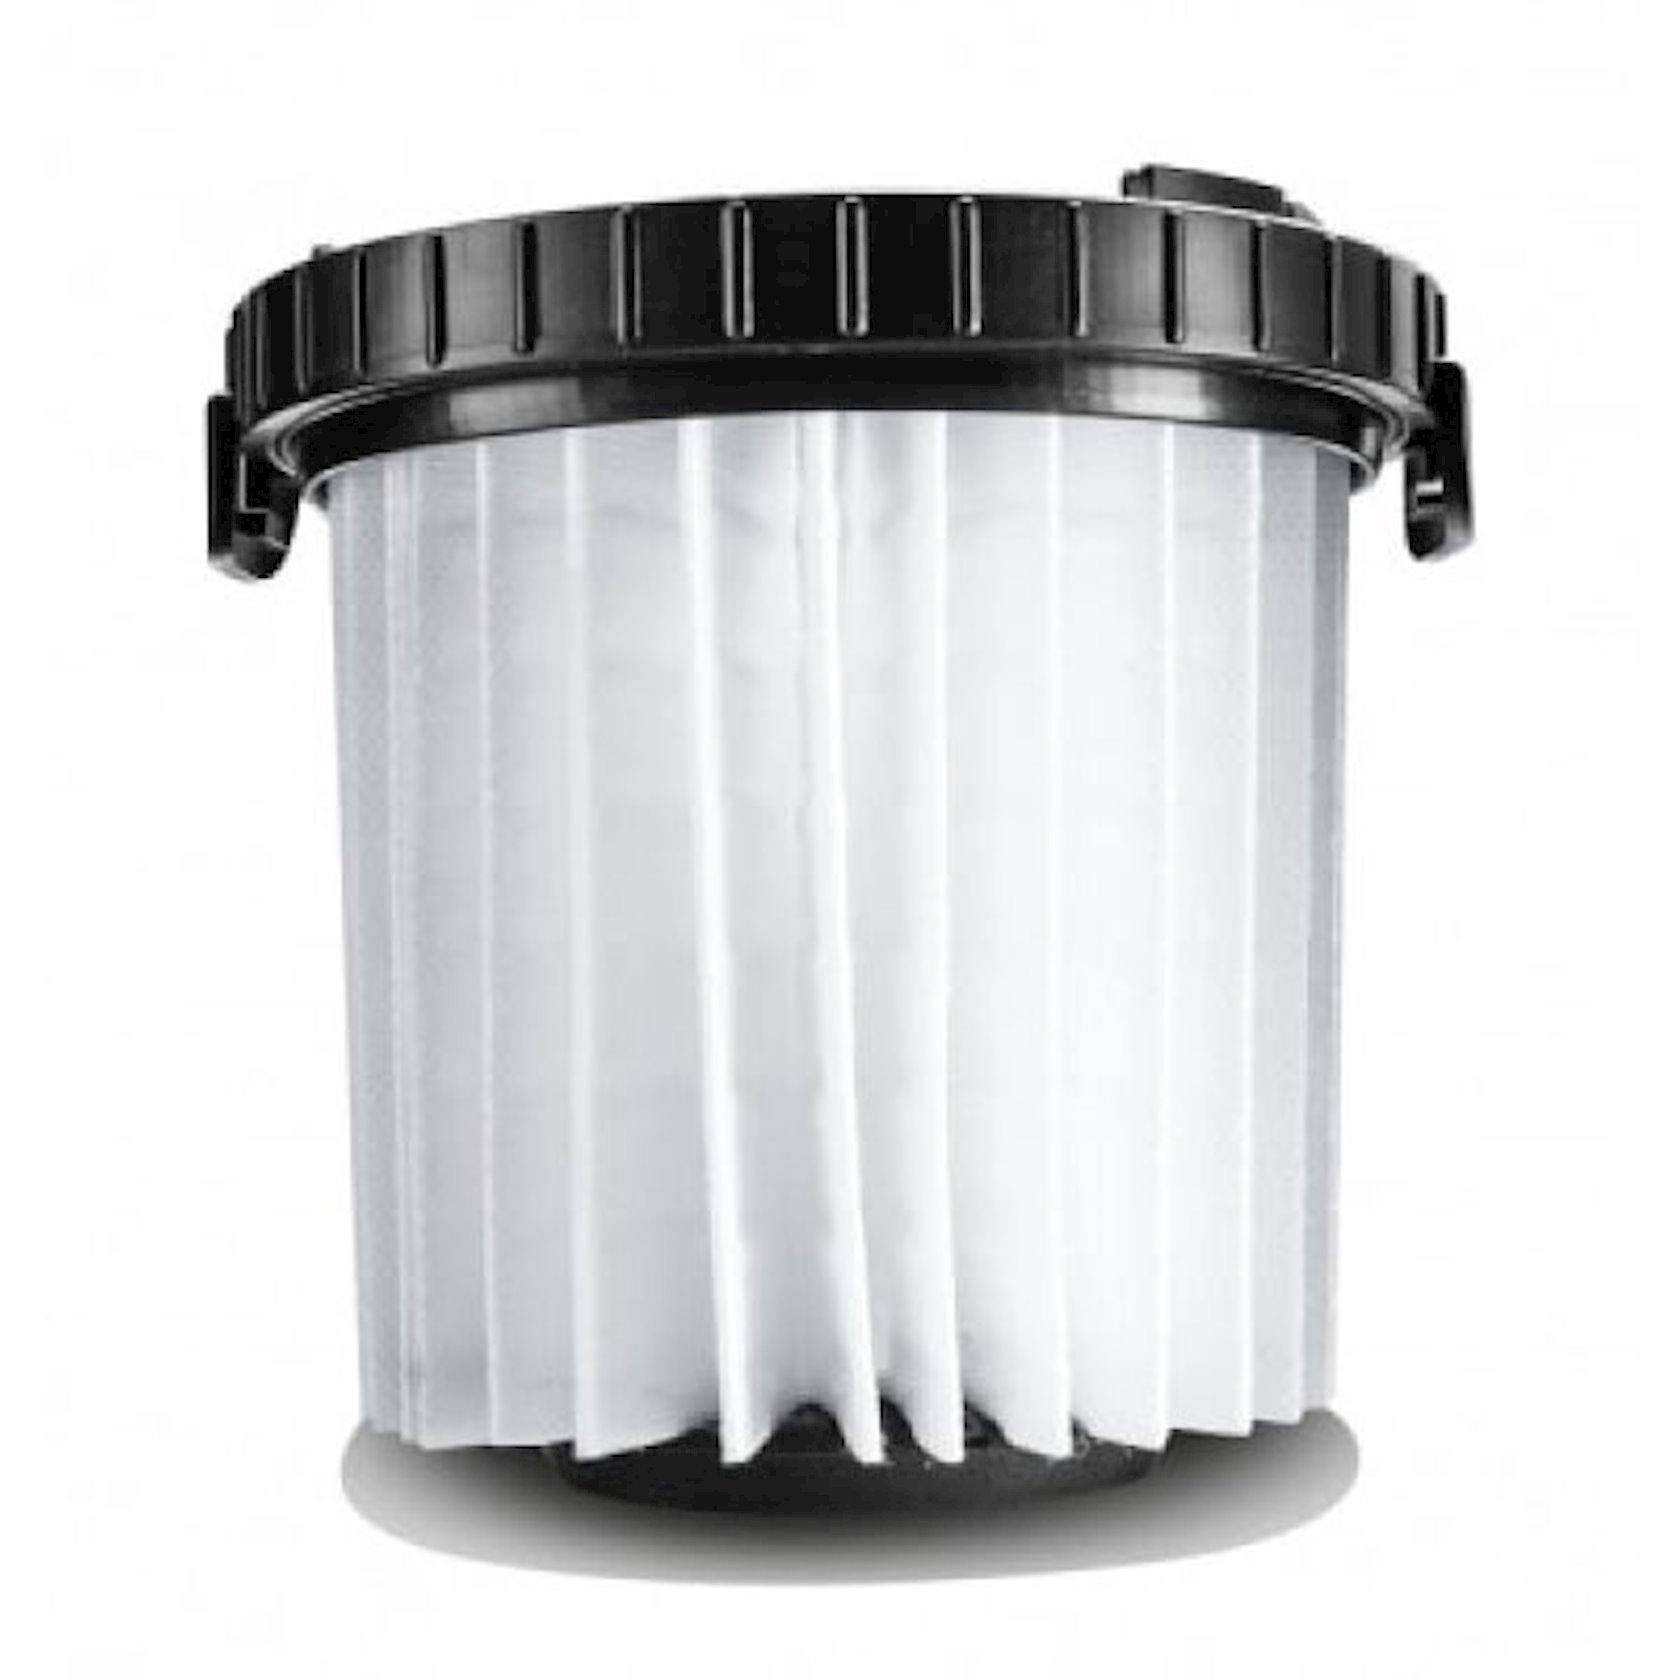 Tozsoran Aksessuarı Karcher Cartridge filter VC 5 (2.863-239.0)